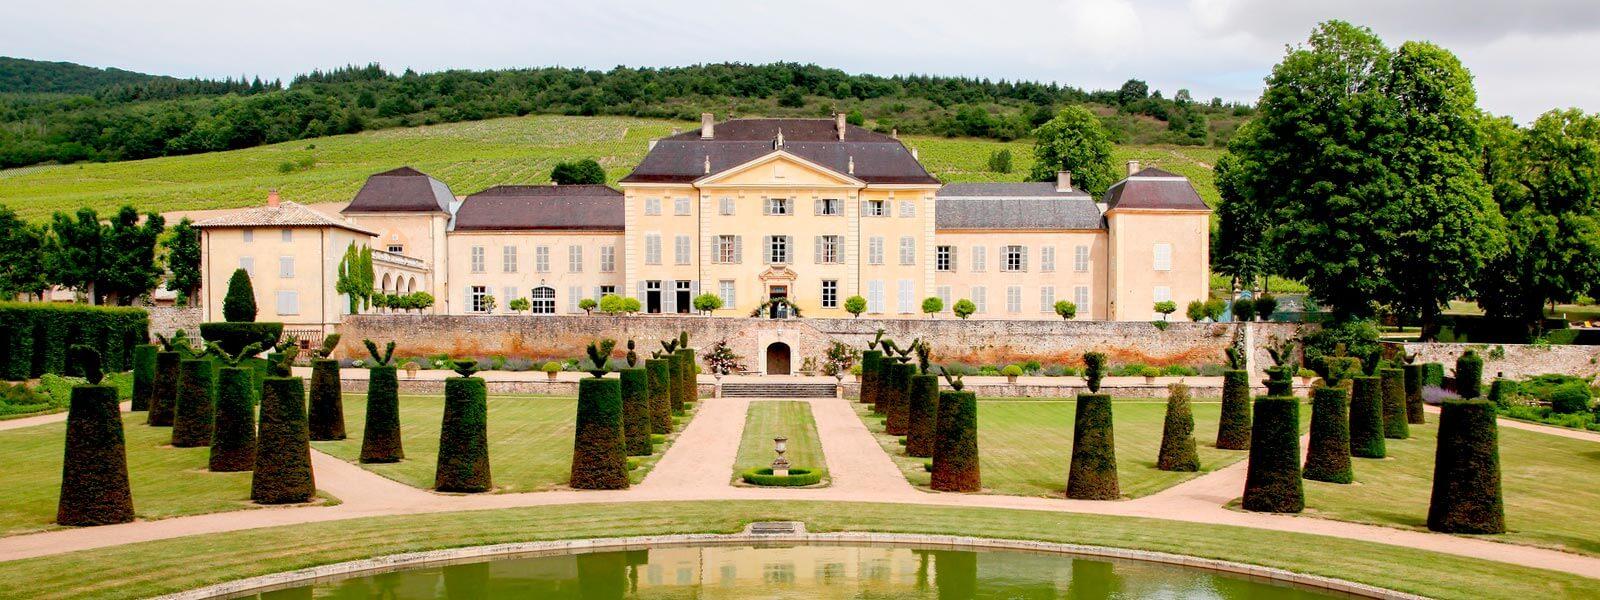 Kanpai Tourisme - Beaujolais Crus & Castles - Morning